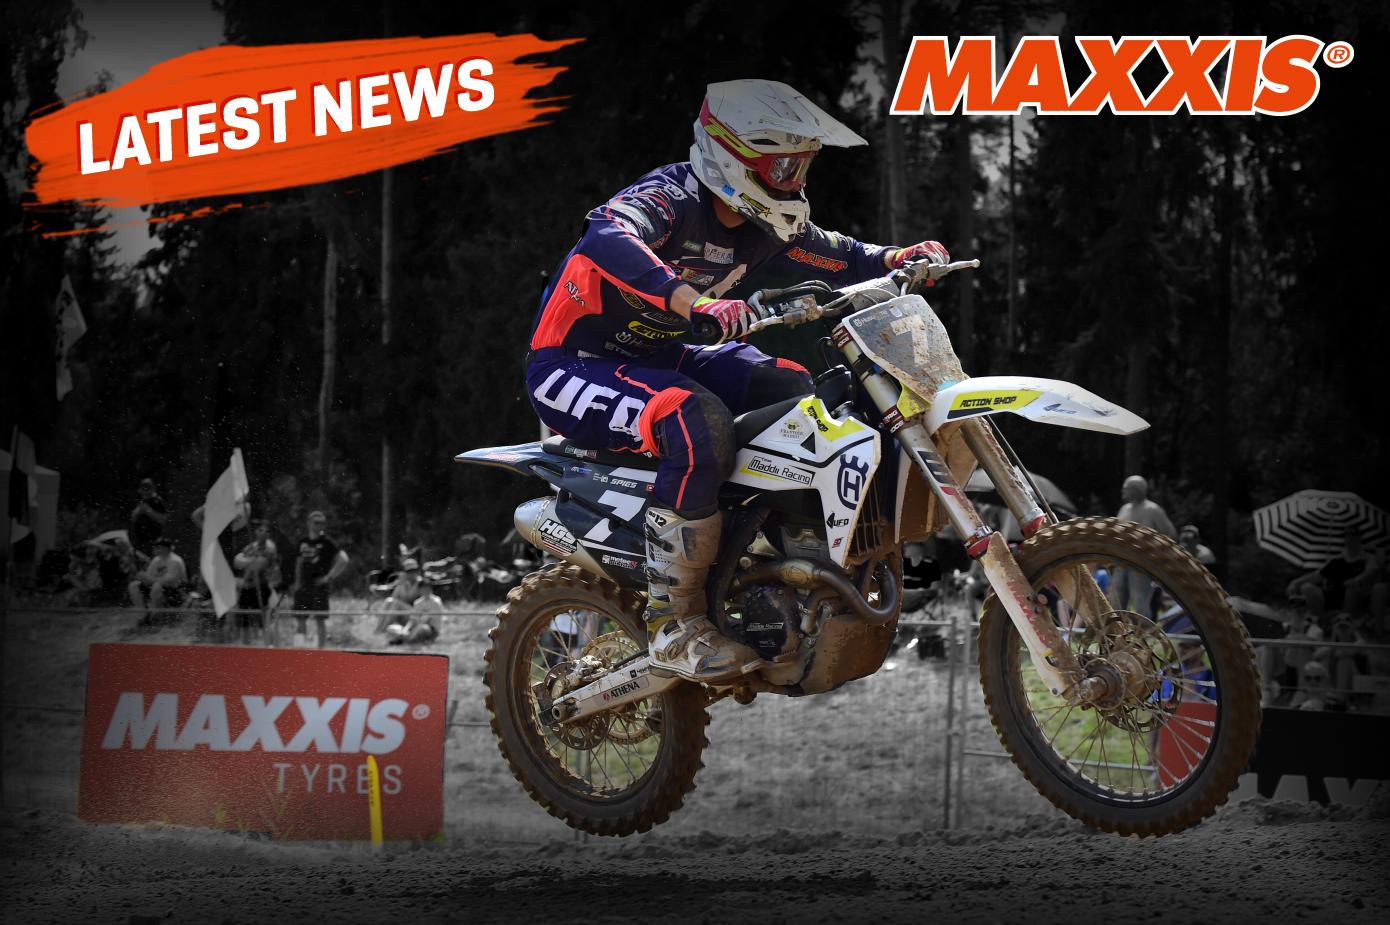 Liam Everts dan Maxxis Gemilang di Putaran Pertama MXGP di Inggris